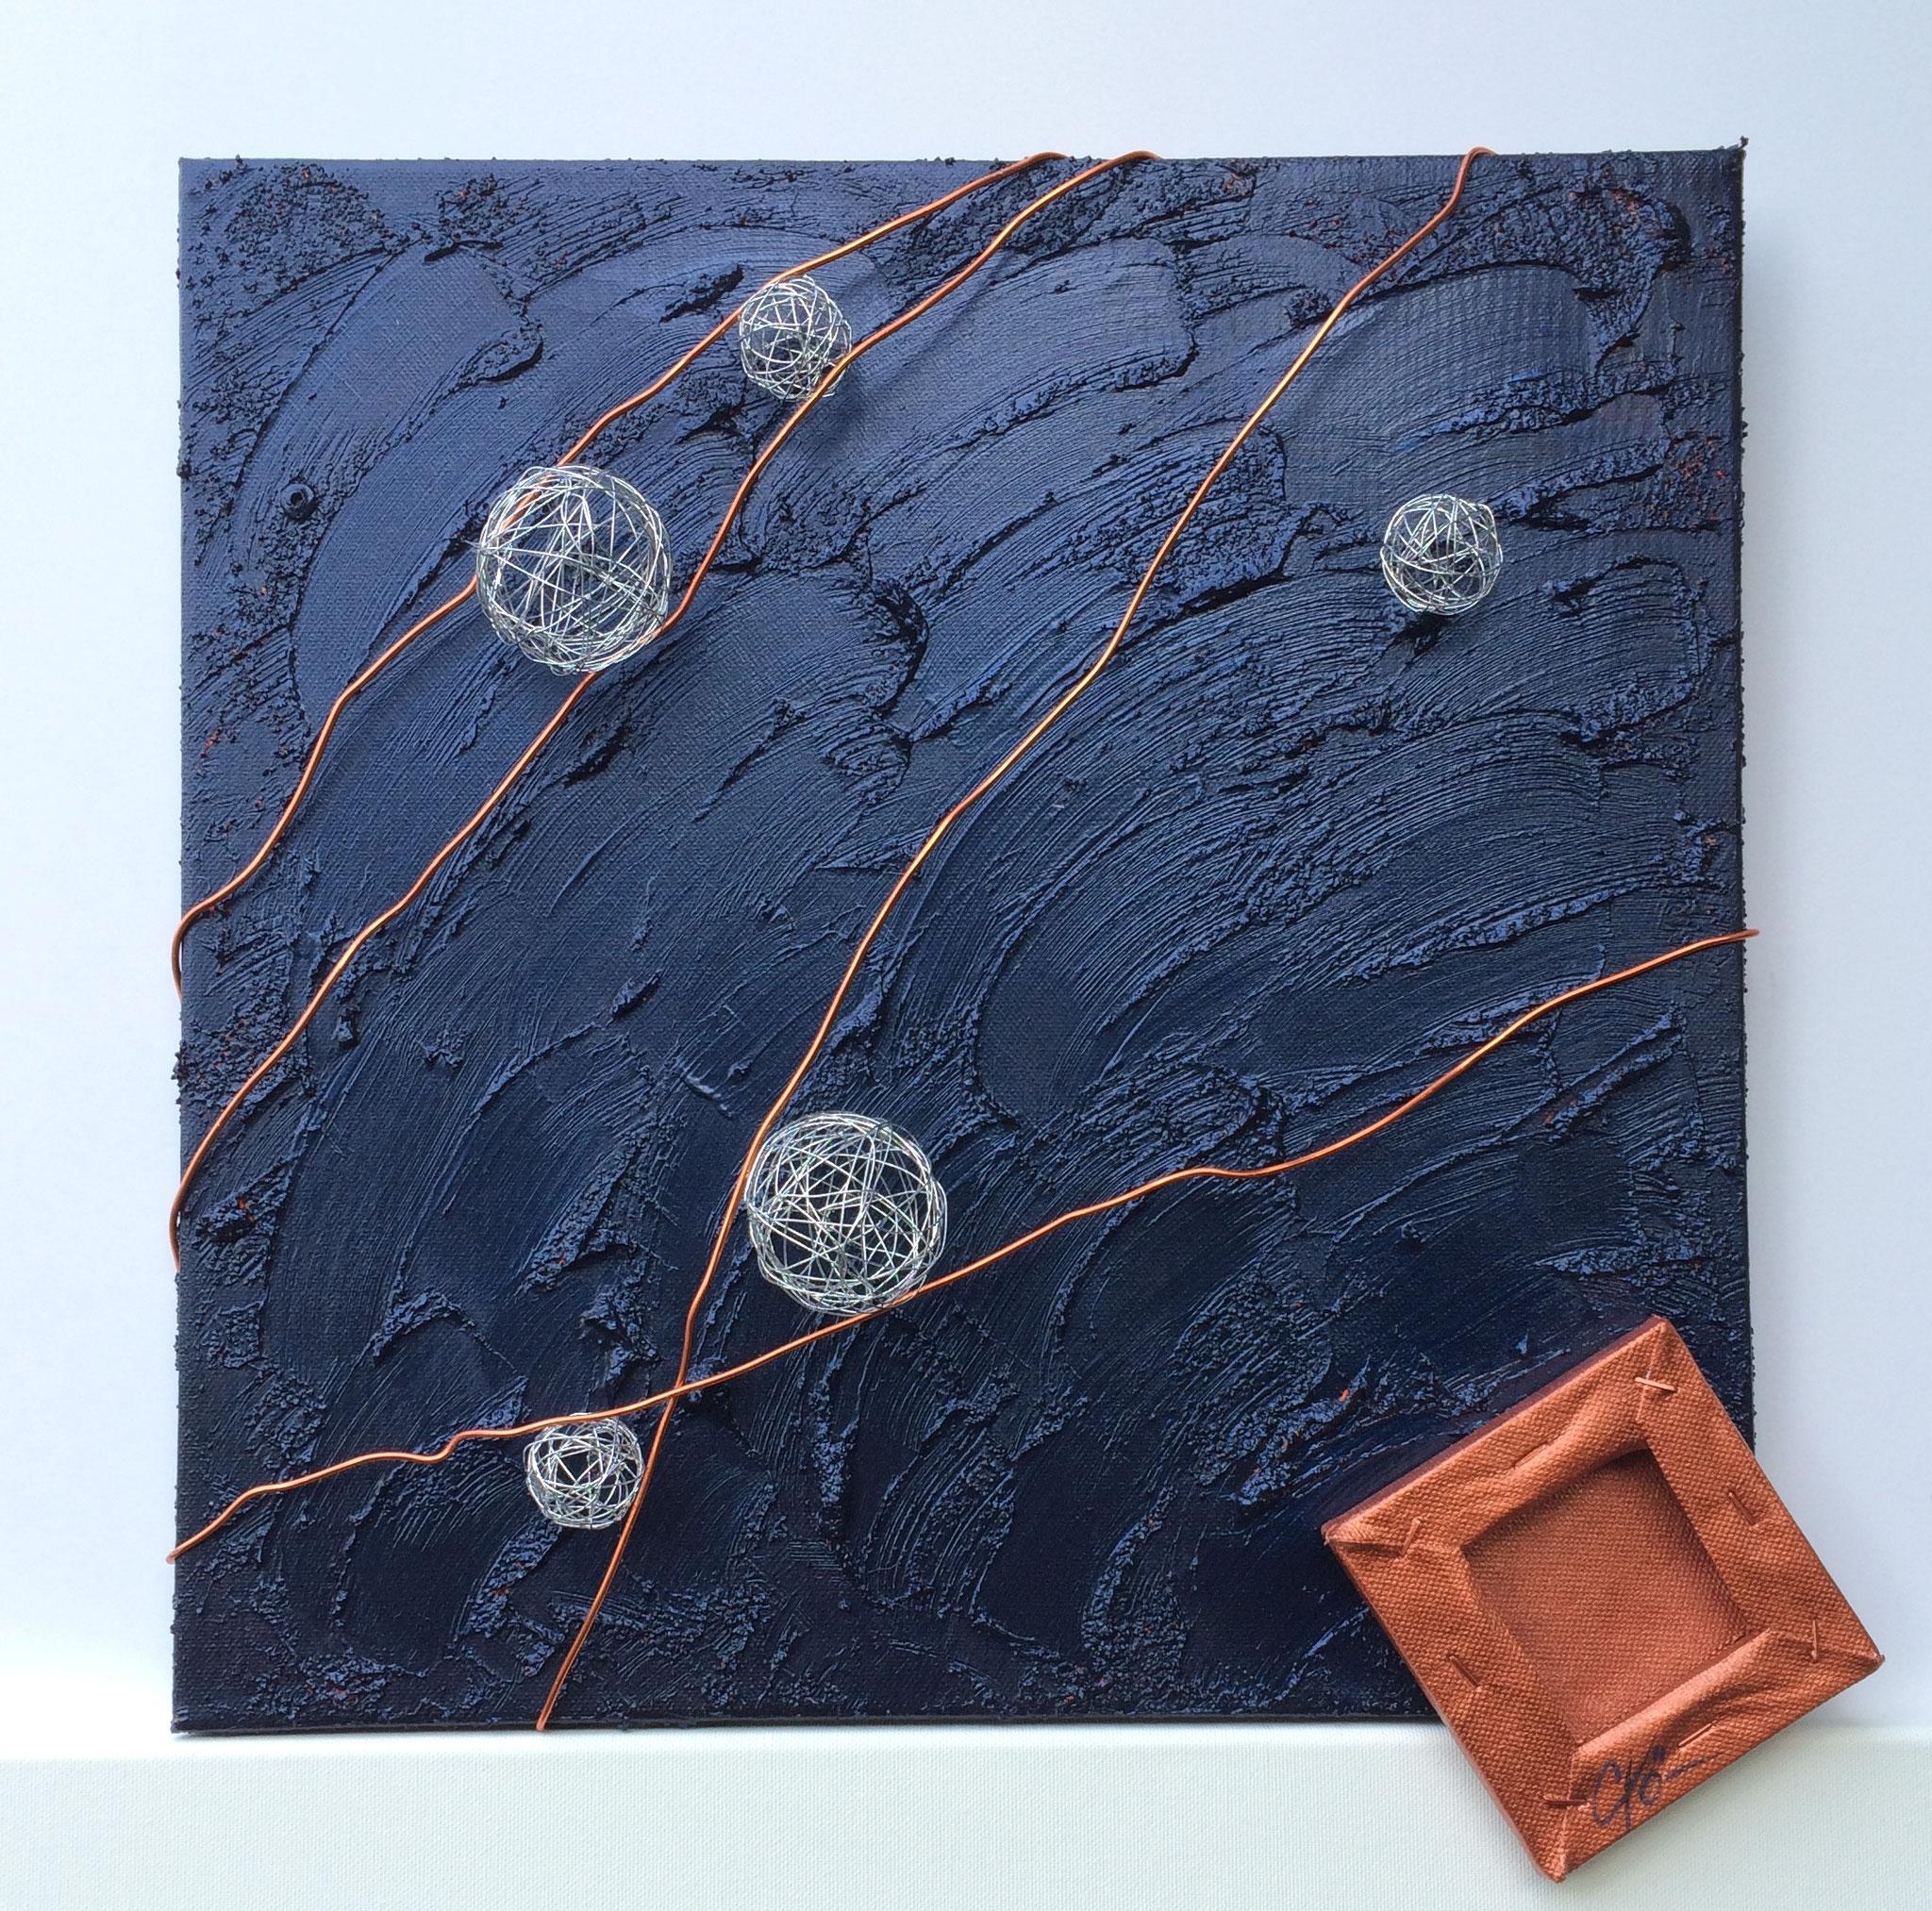 Les météorites - 40 x 40 cm